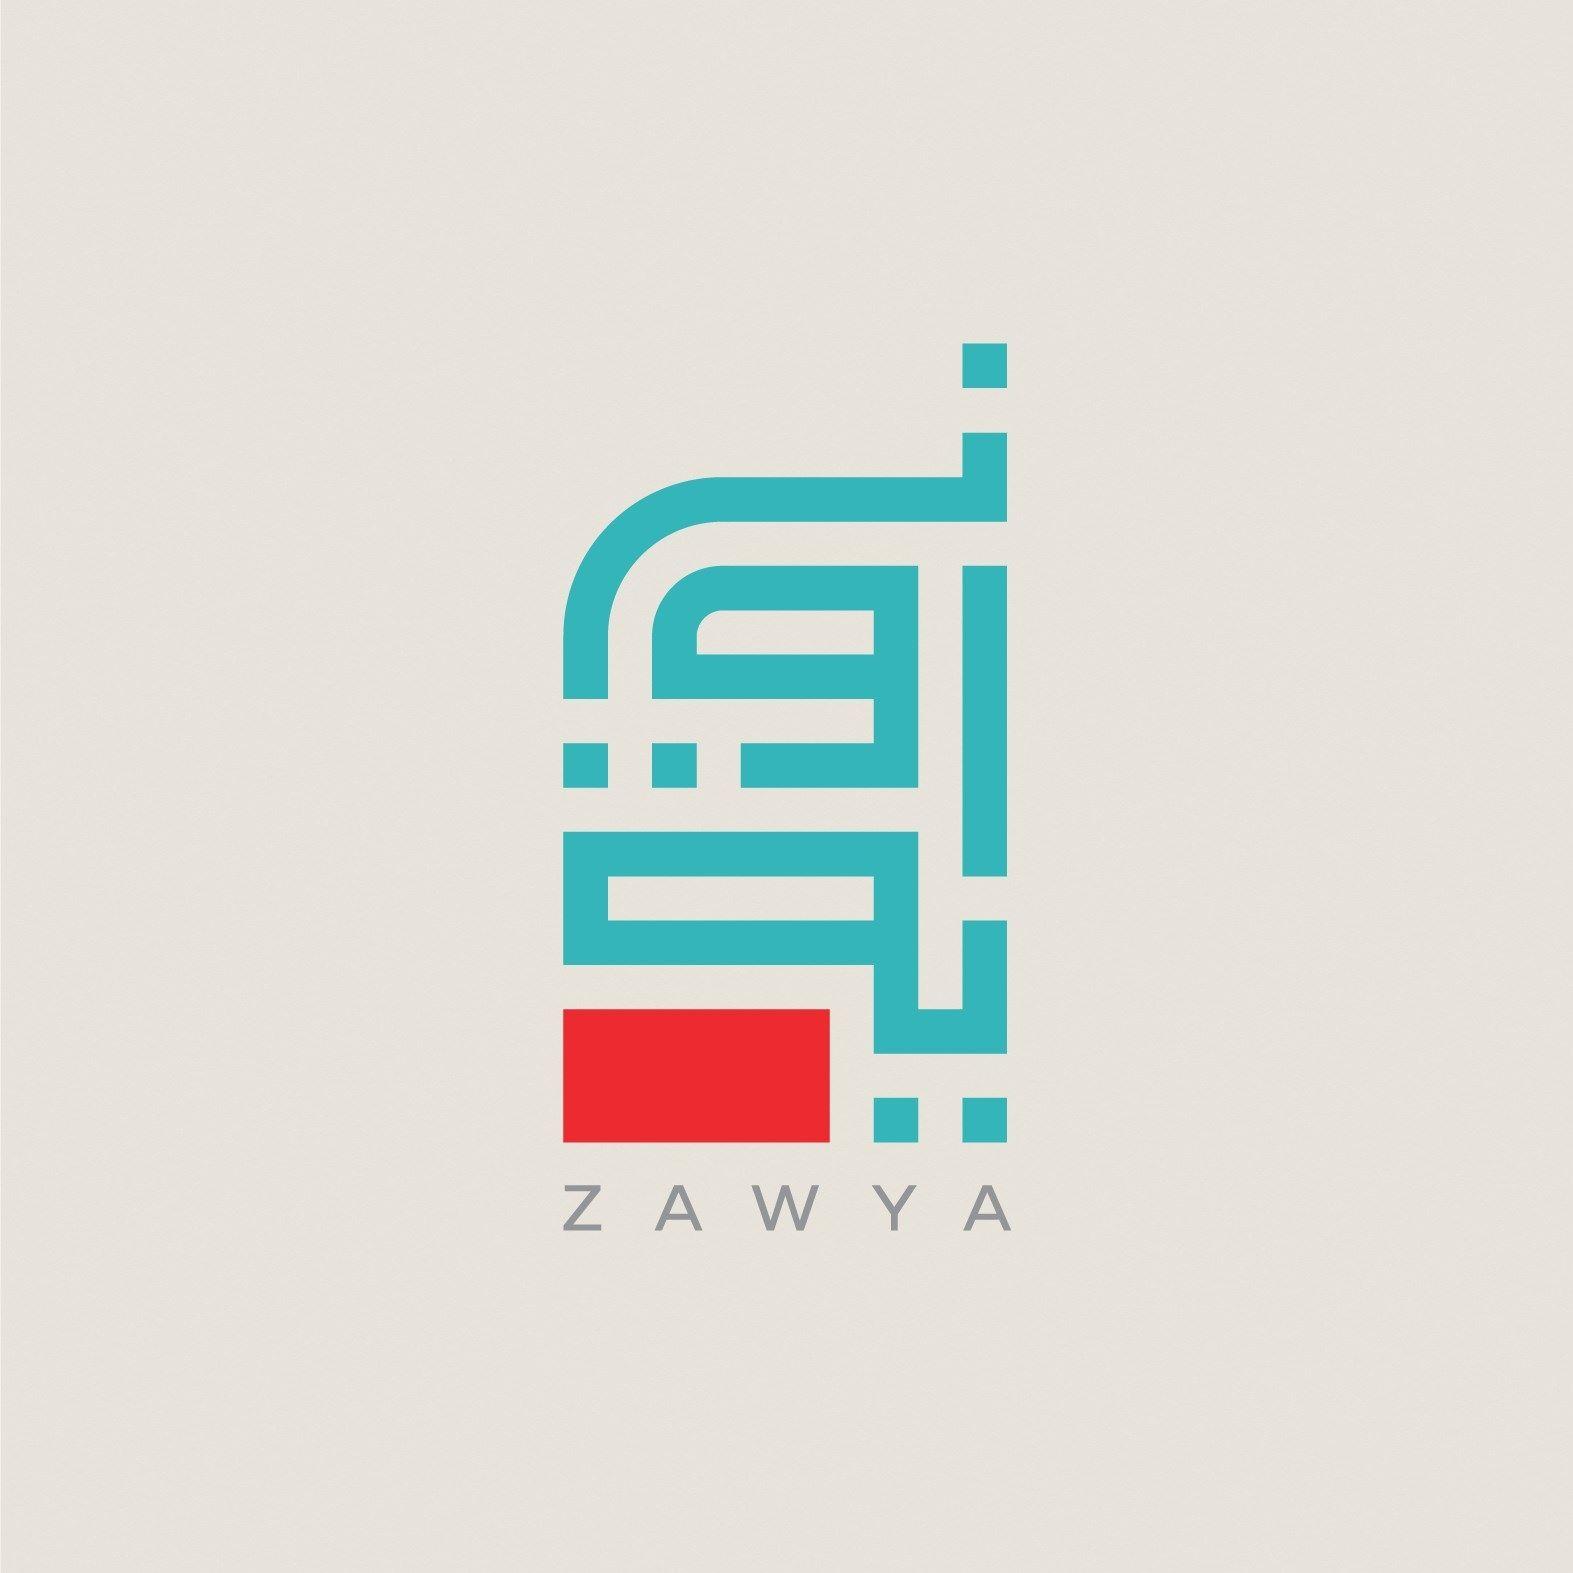 'Fight like a girl' at Zawya cinema